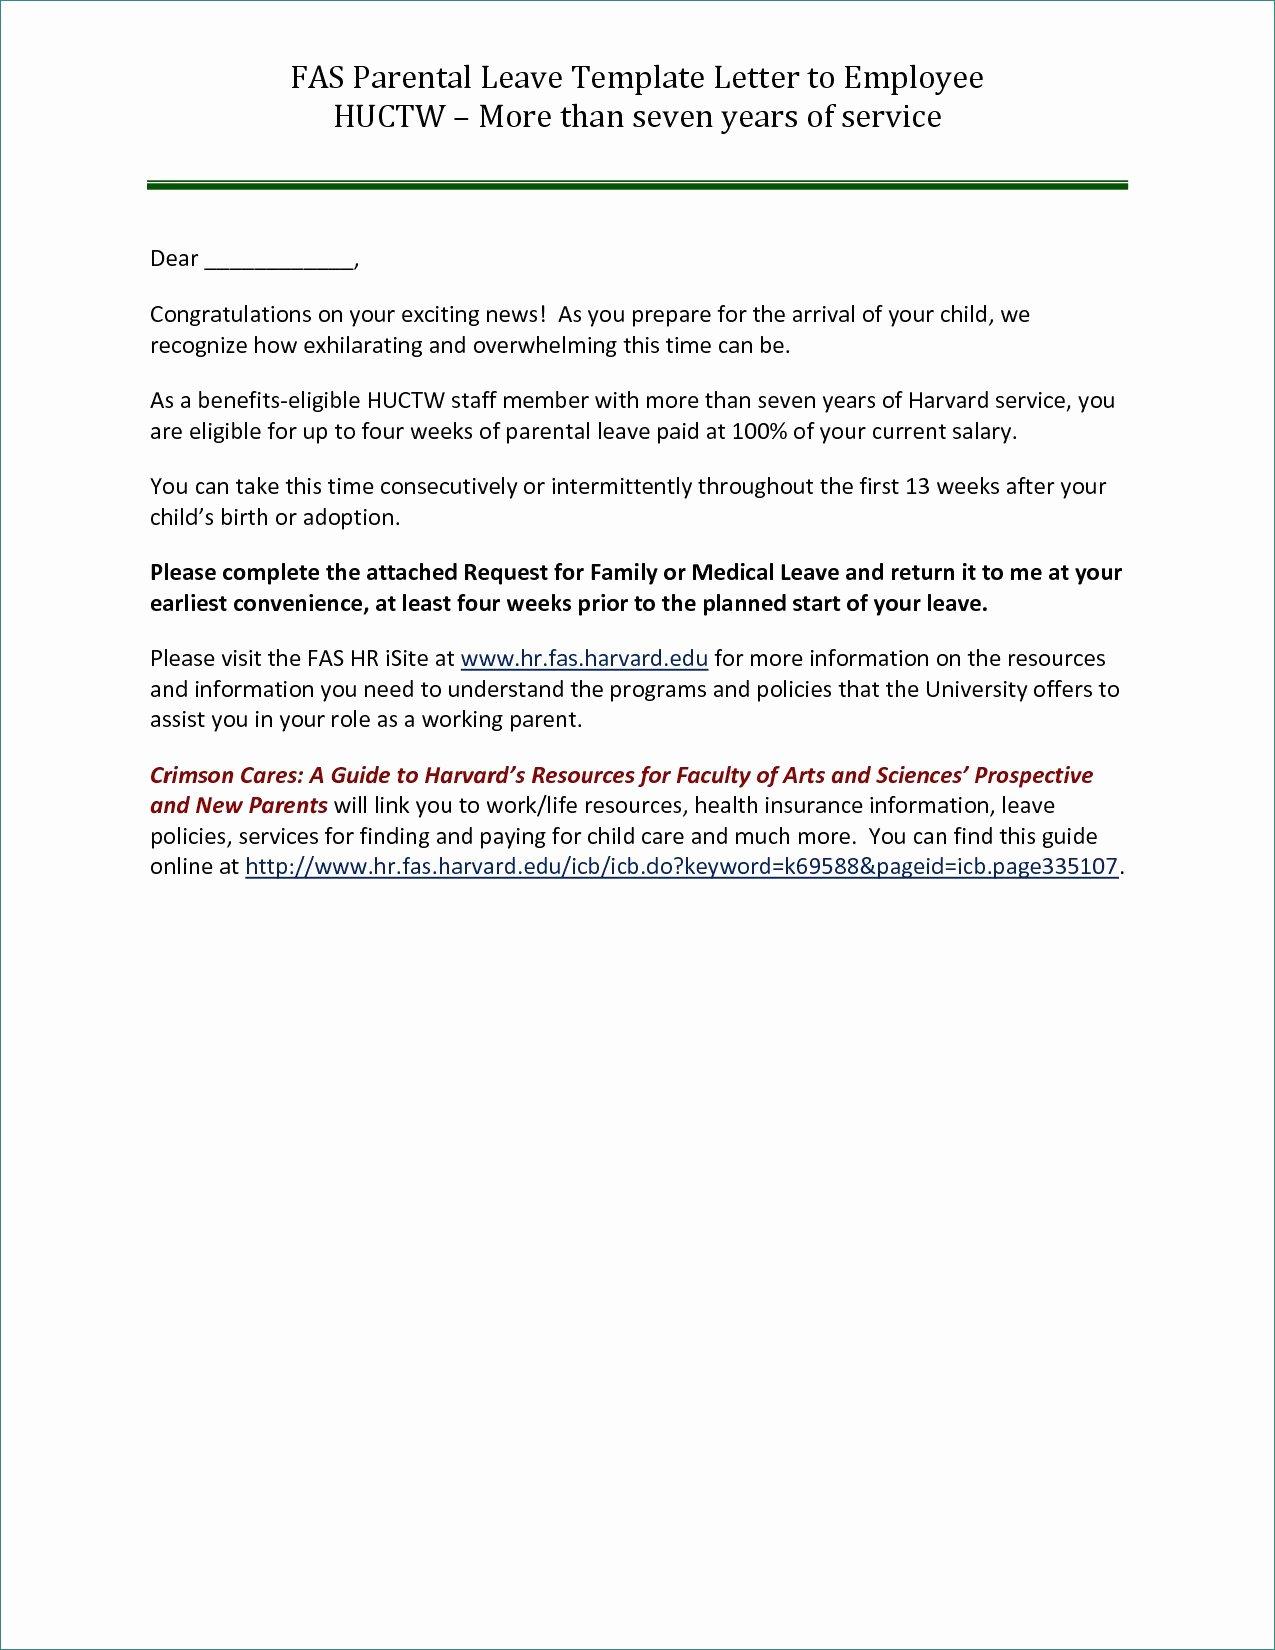 Sample Open Enrollment Letters Fresh Sample Letter to Employees Regarding Benefits Antique